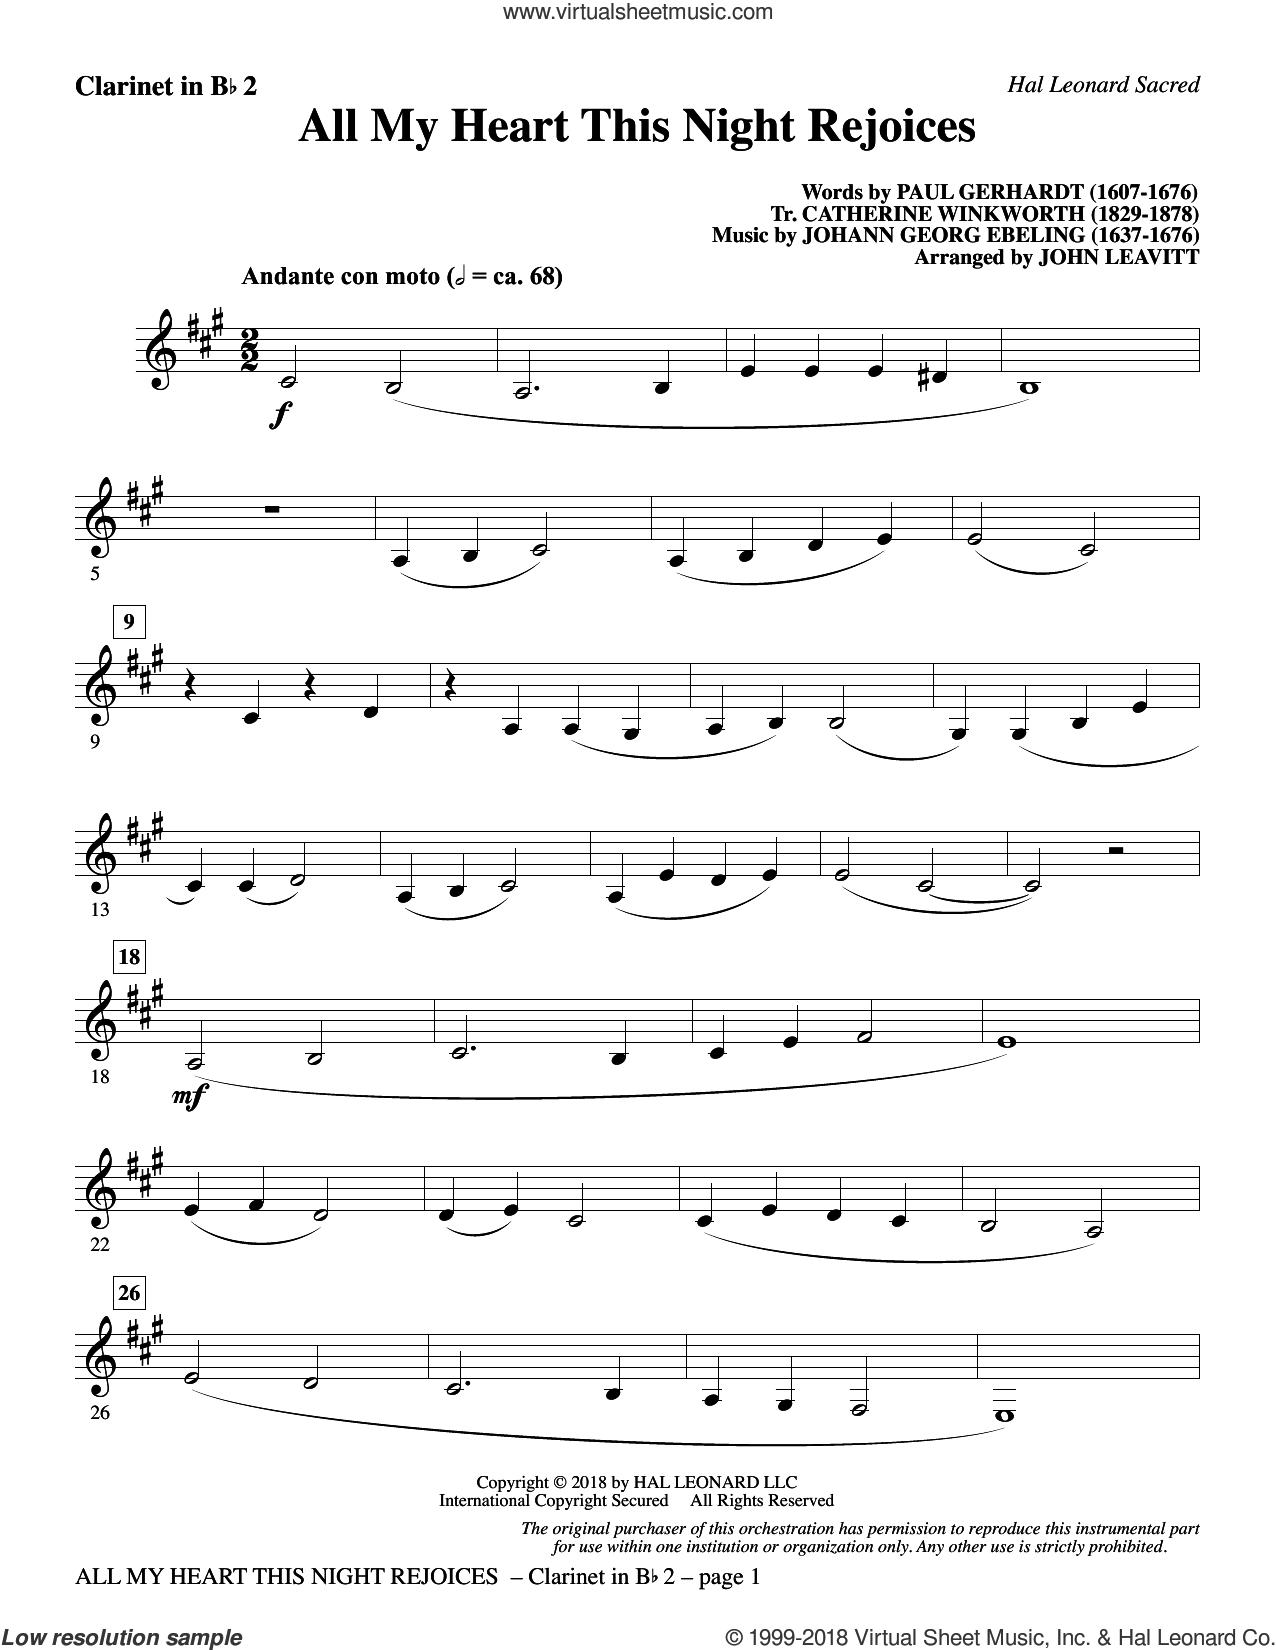 All My Heart This Night Rejoices (arr. John Leavitt) sheet music for orchestra/band (Bb clarinet 2) by Catherine Winkworth, John Leavitt, Johann Georg Ebeling and Paul Gerhardt, intermediate skill level